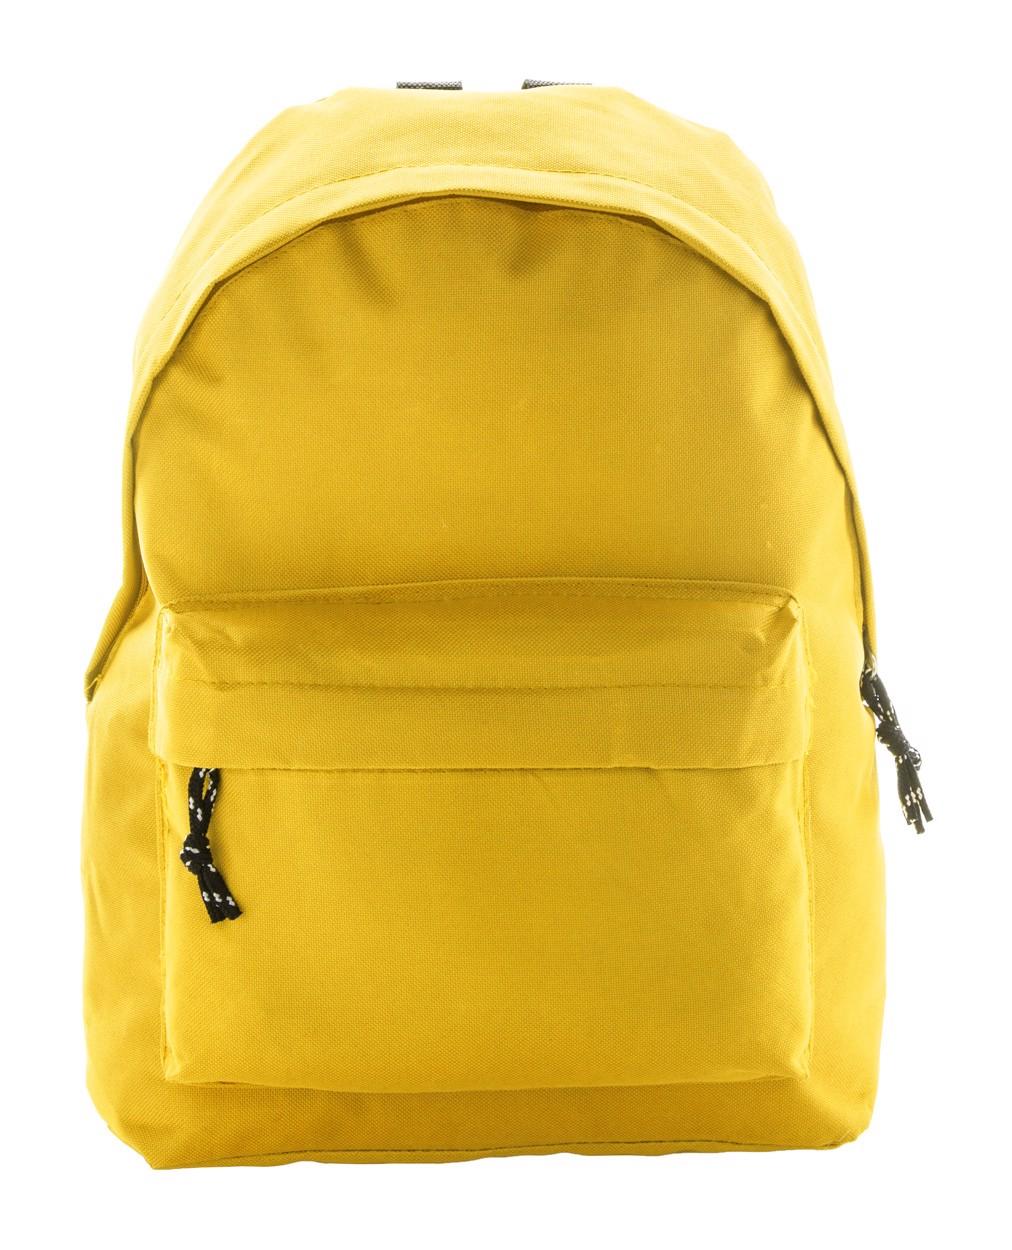 Batoh Discovery - Žlutá